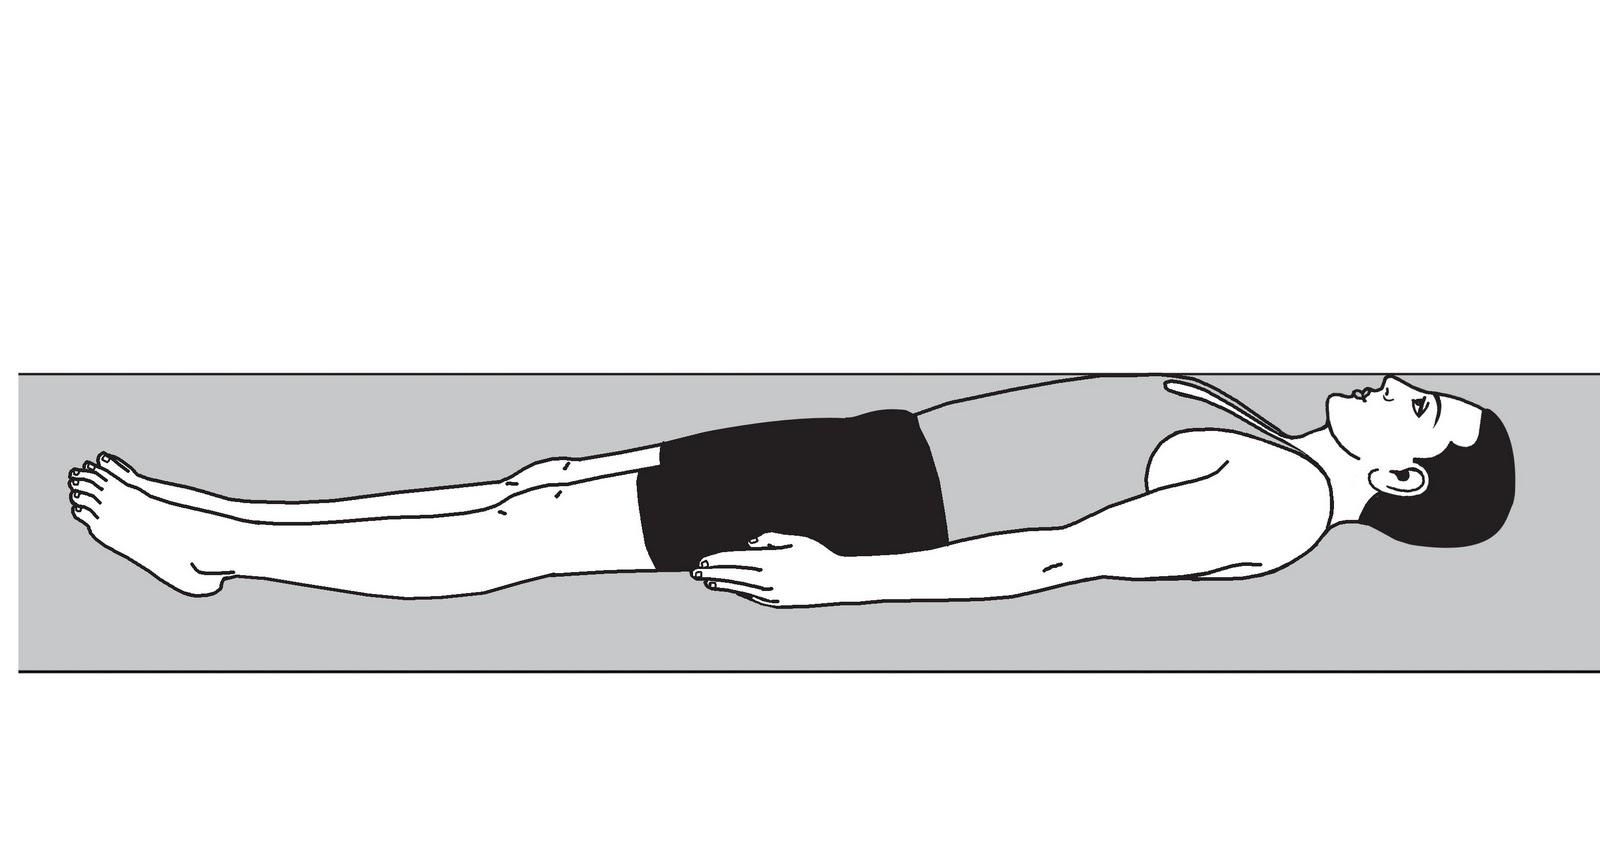 wellness for life shavasan corpse pose dead man s pose